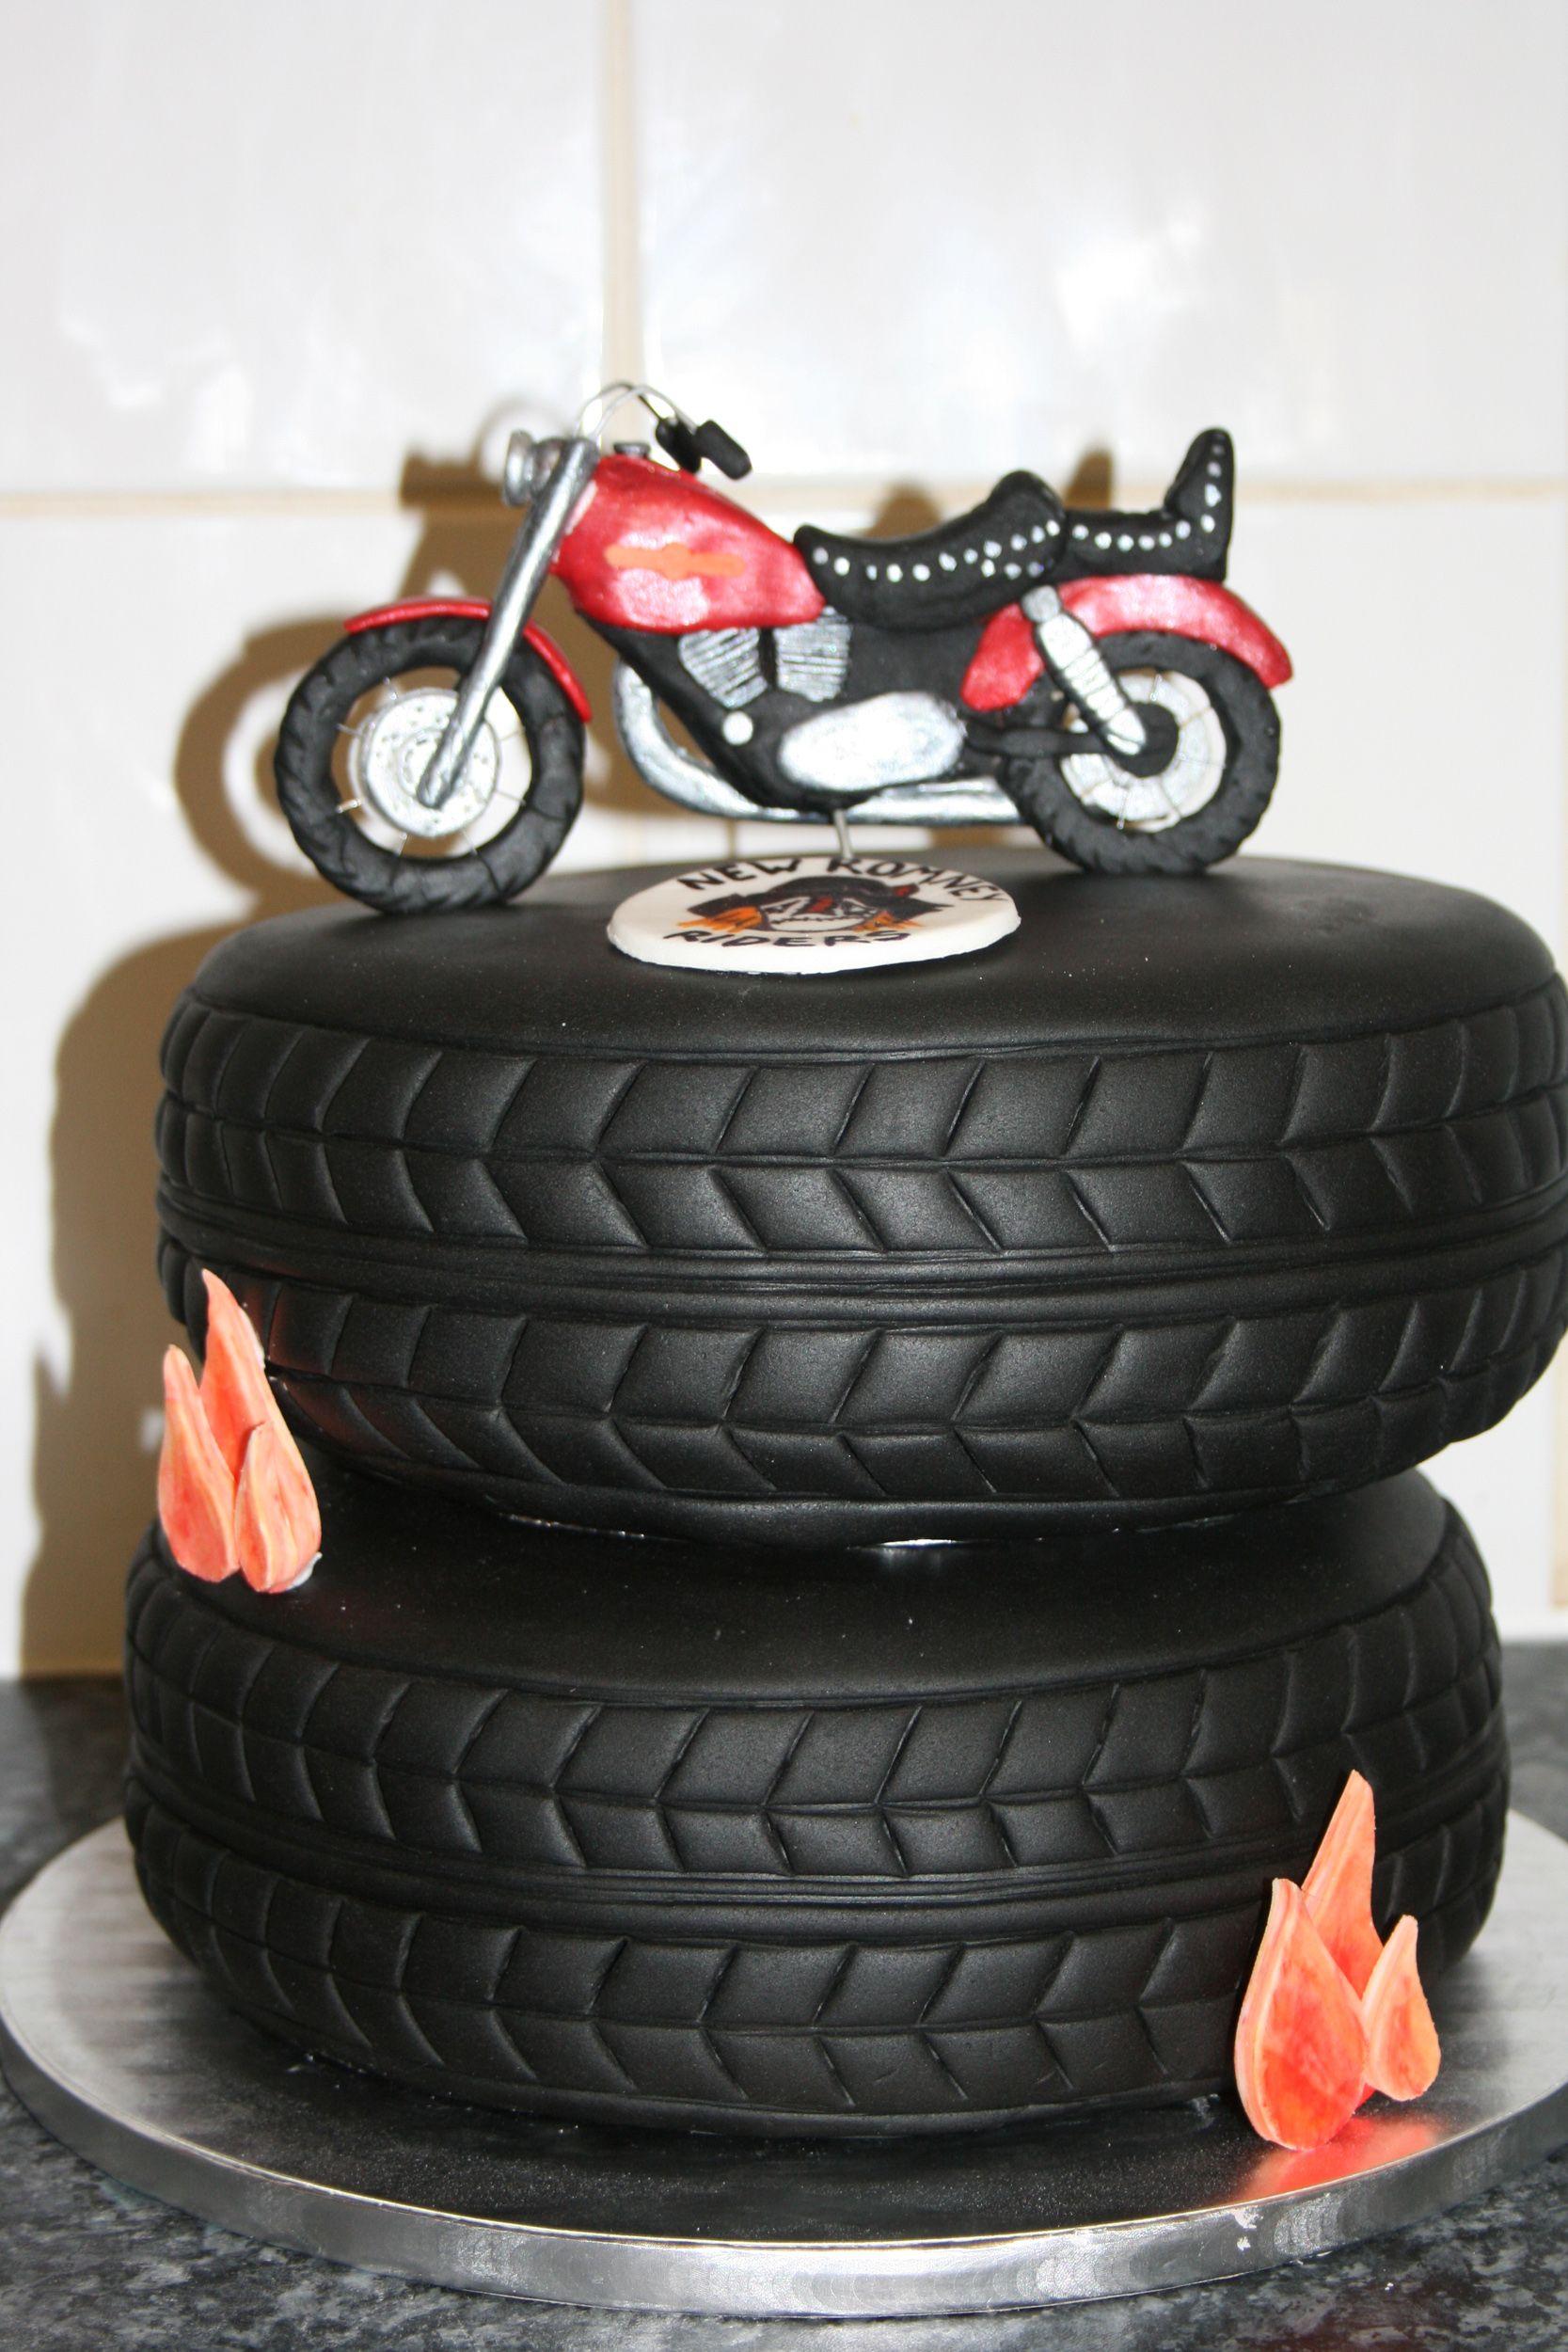 Awe Inspiring Harley Davidson Cake Motorcycle Birthday Cakes Motorbike Cake Personalised Birthday Cards Epsylily Jamesorg